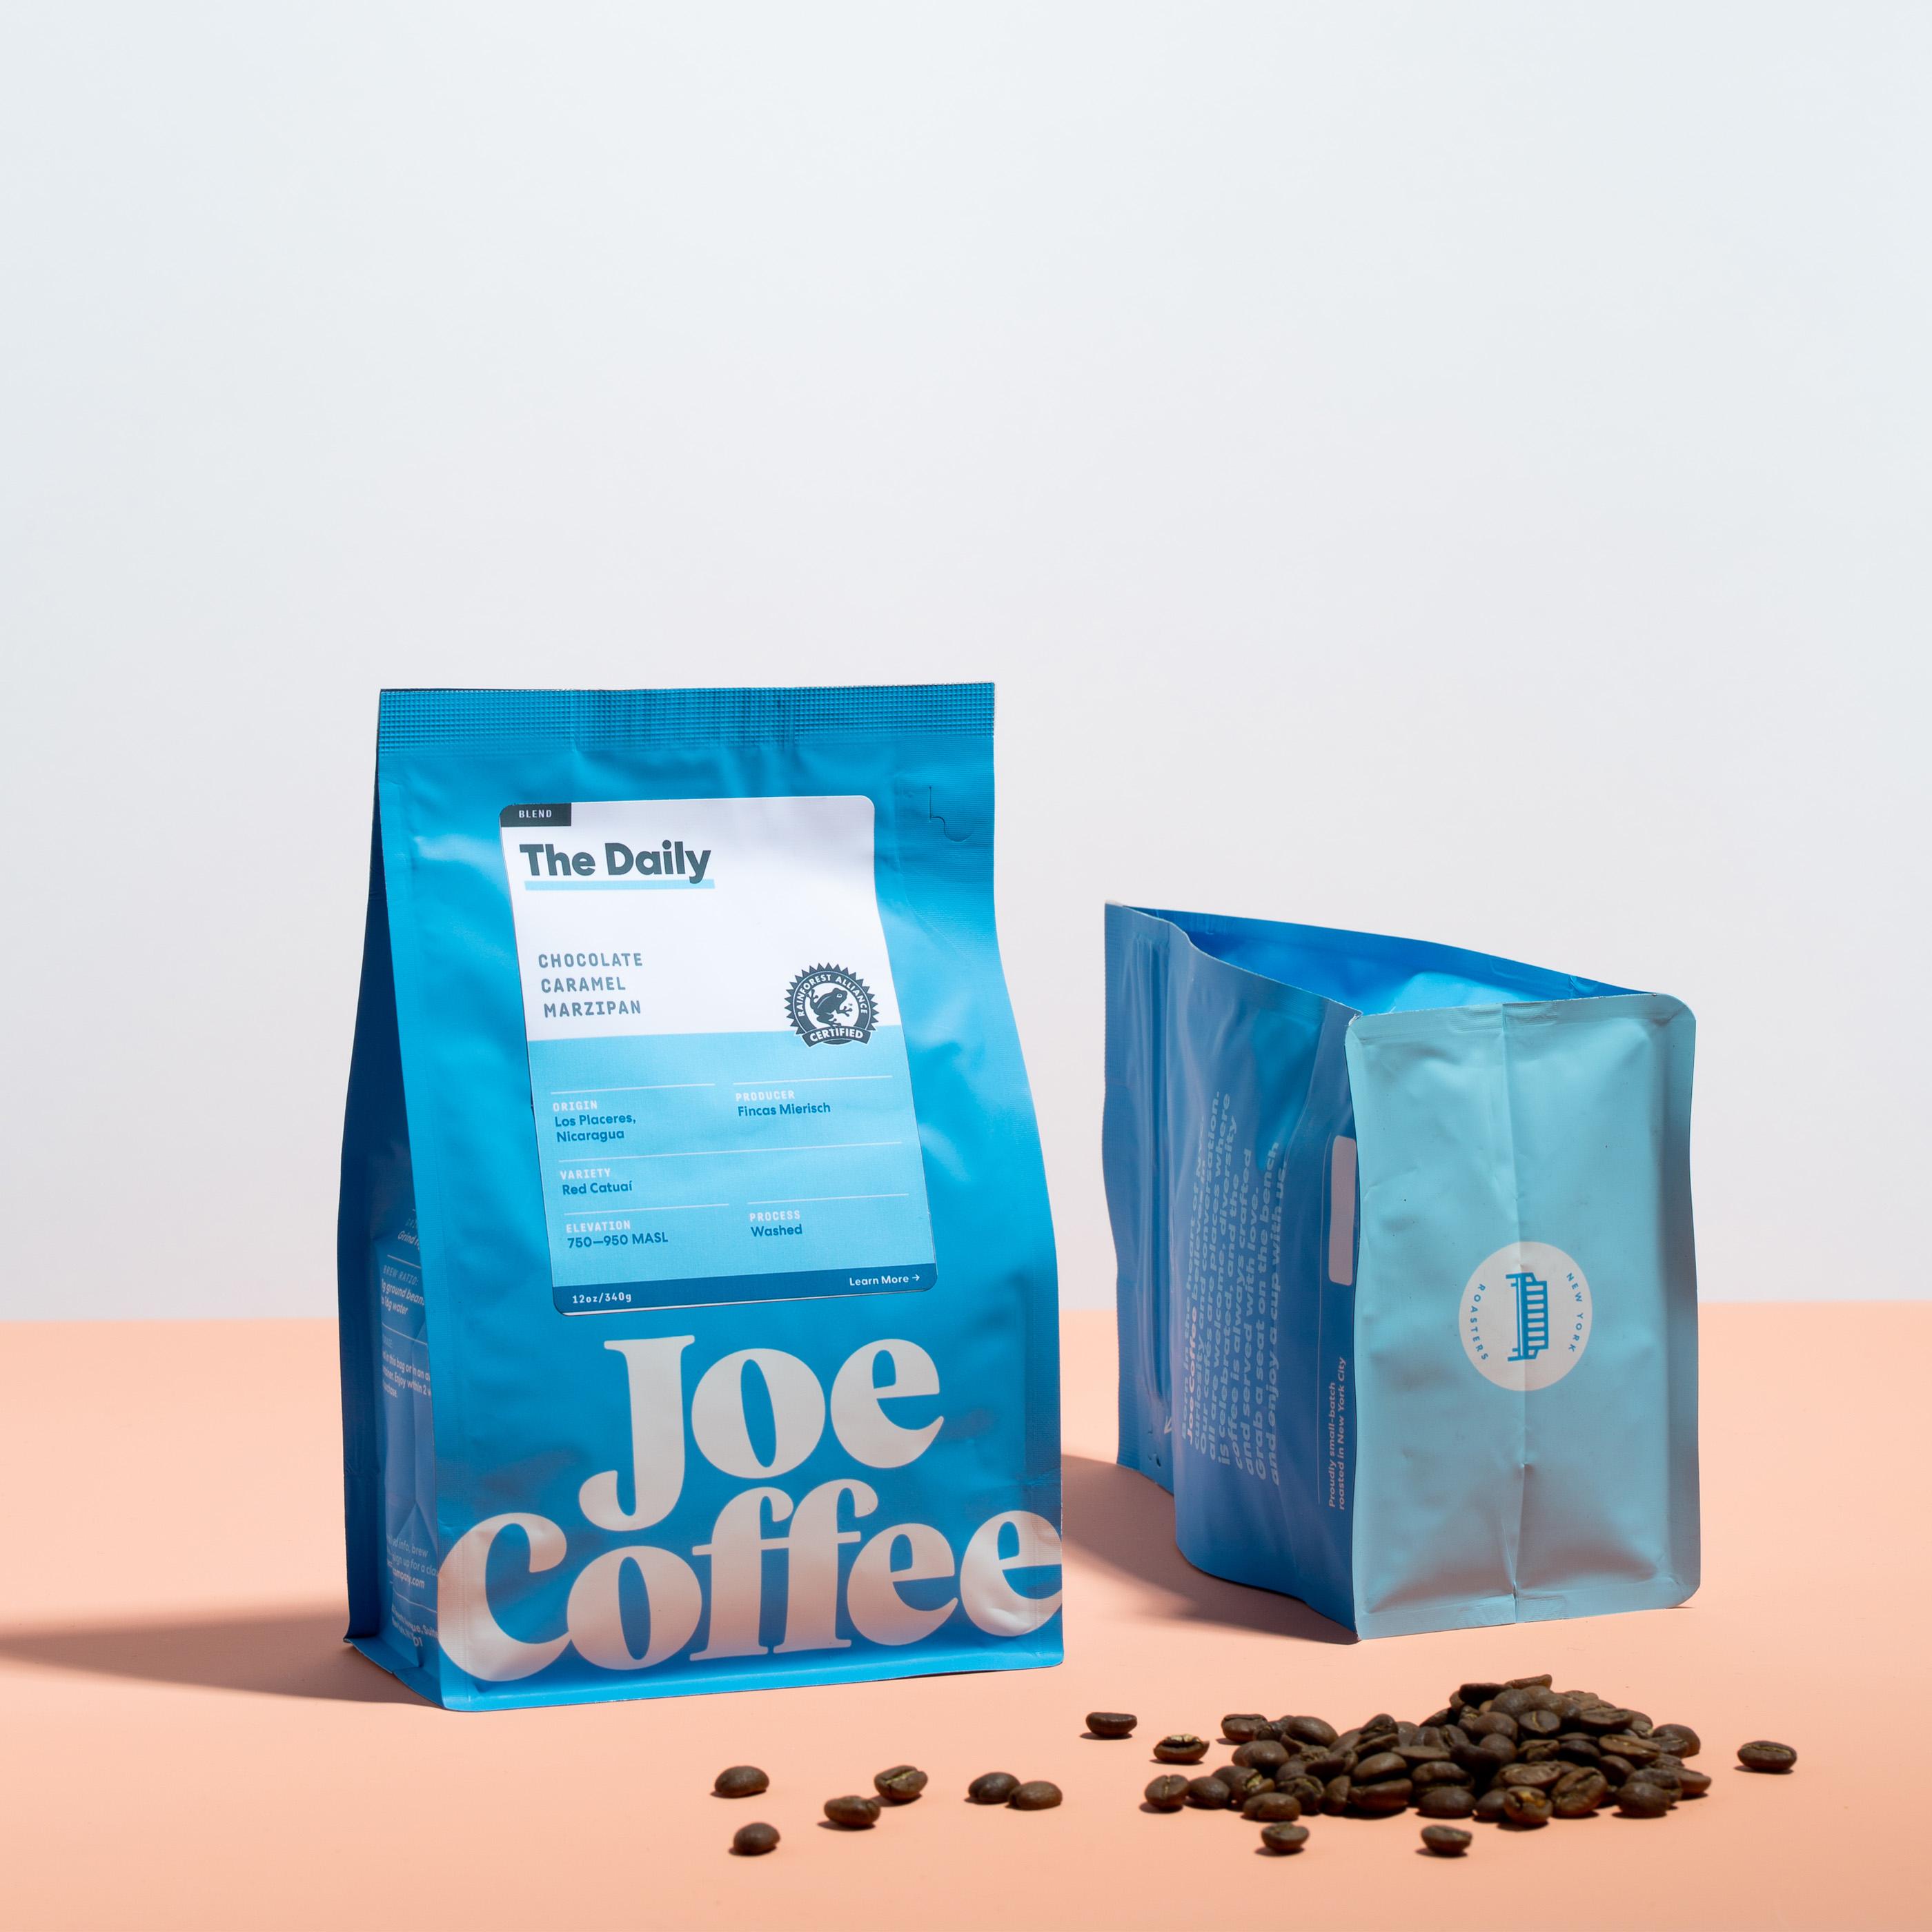 The Daily Subscription – Joe Coffee Company